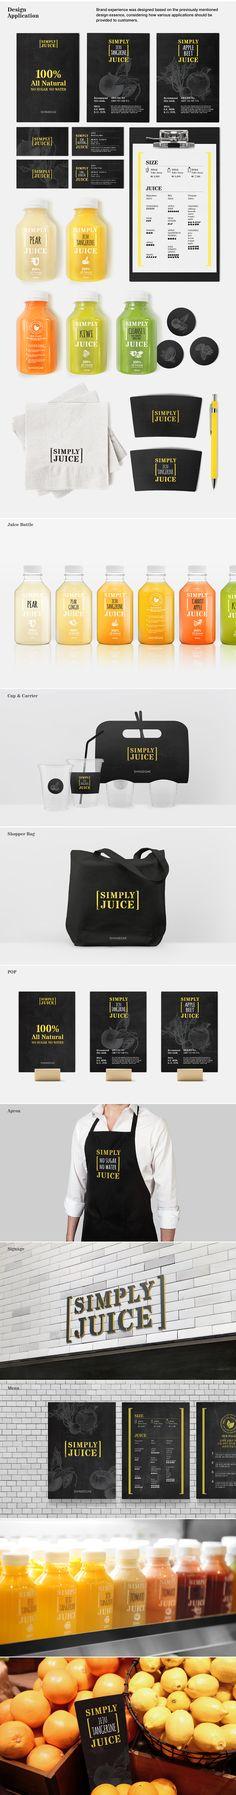 SHINSEGAE Simply Juice Brand eXperience Design on Branding Served